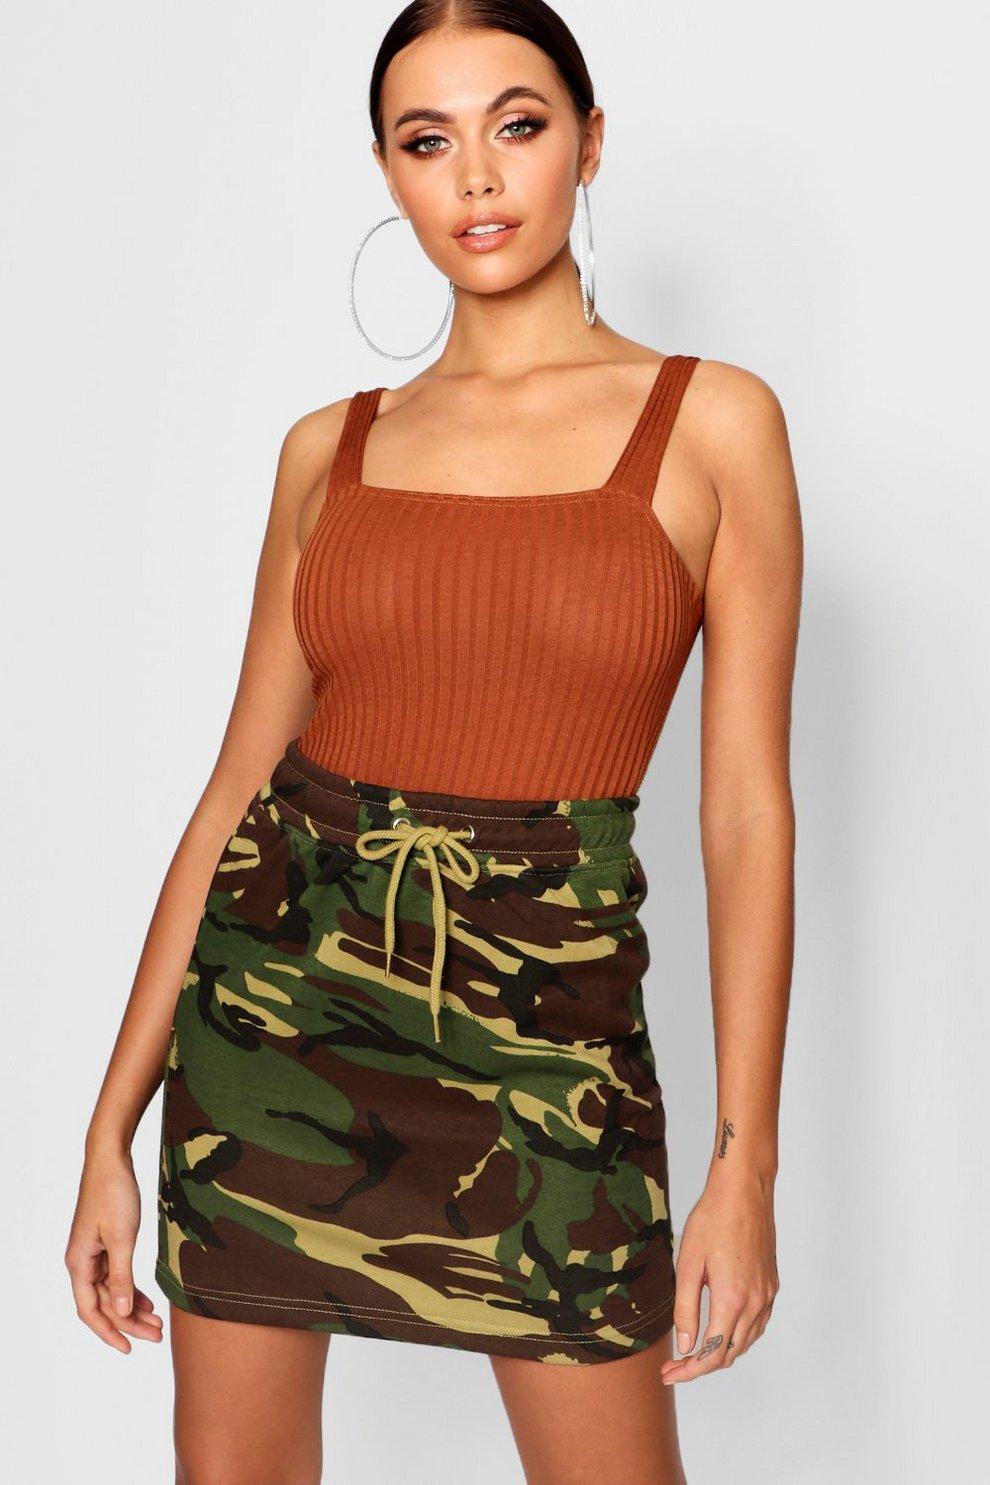 64076b357ed2 Minirock aus Sweatshirt-Stoff mit Camouflage-Print